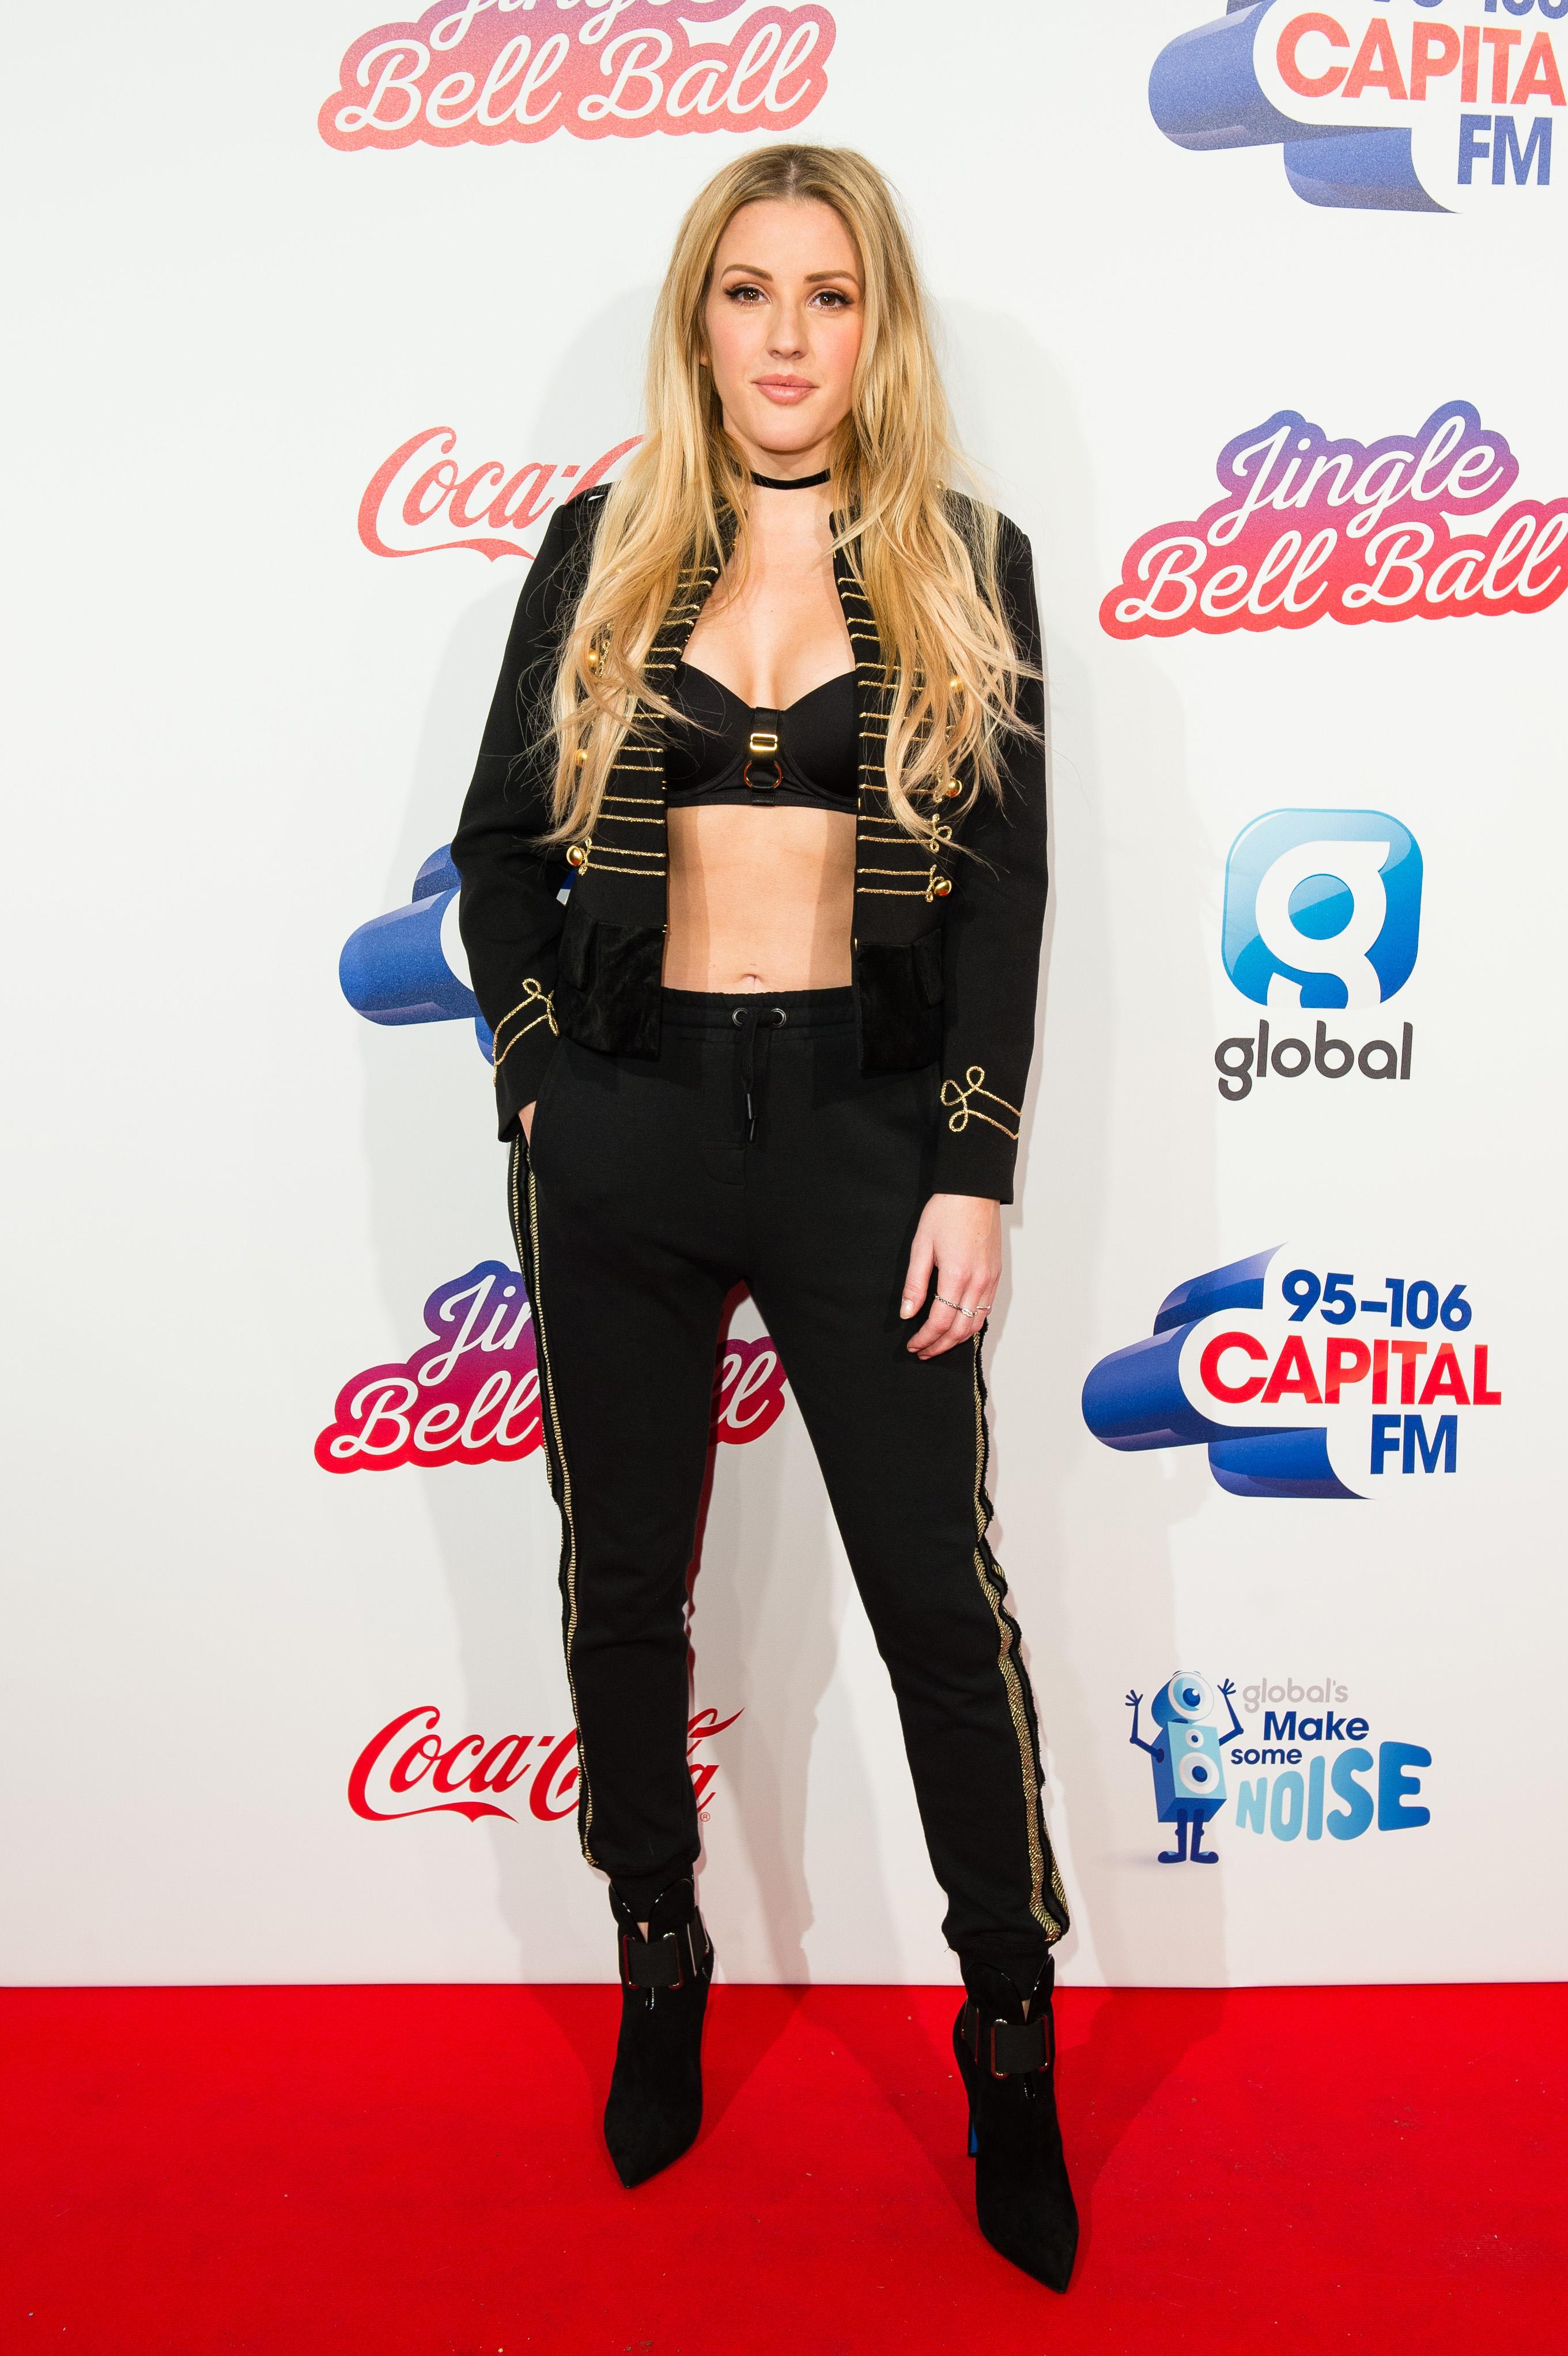 Ellie Goulding Jingle Bell Ball 2016 Red Carpet